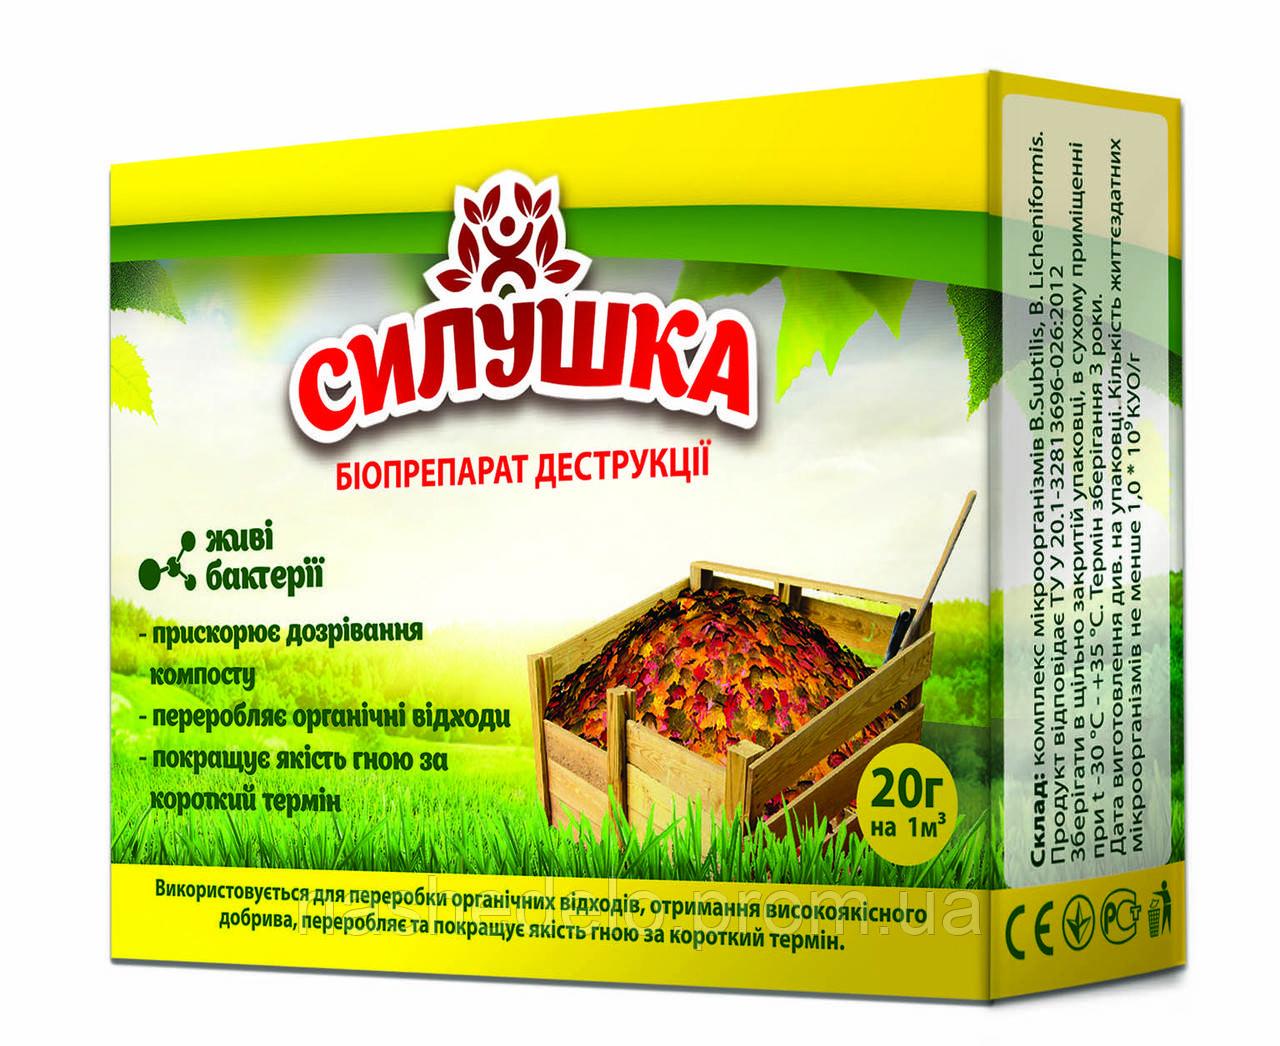 Силушка 50 гр. биопрепарат для компостирования